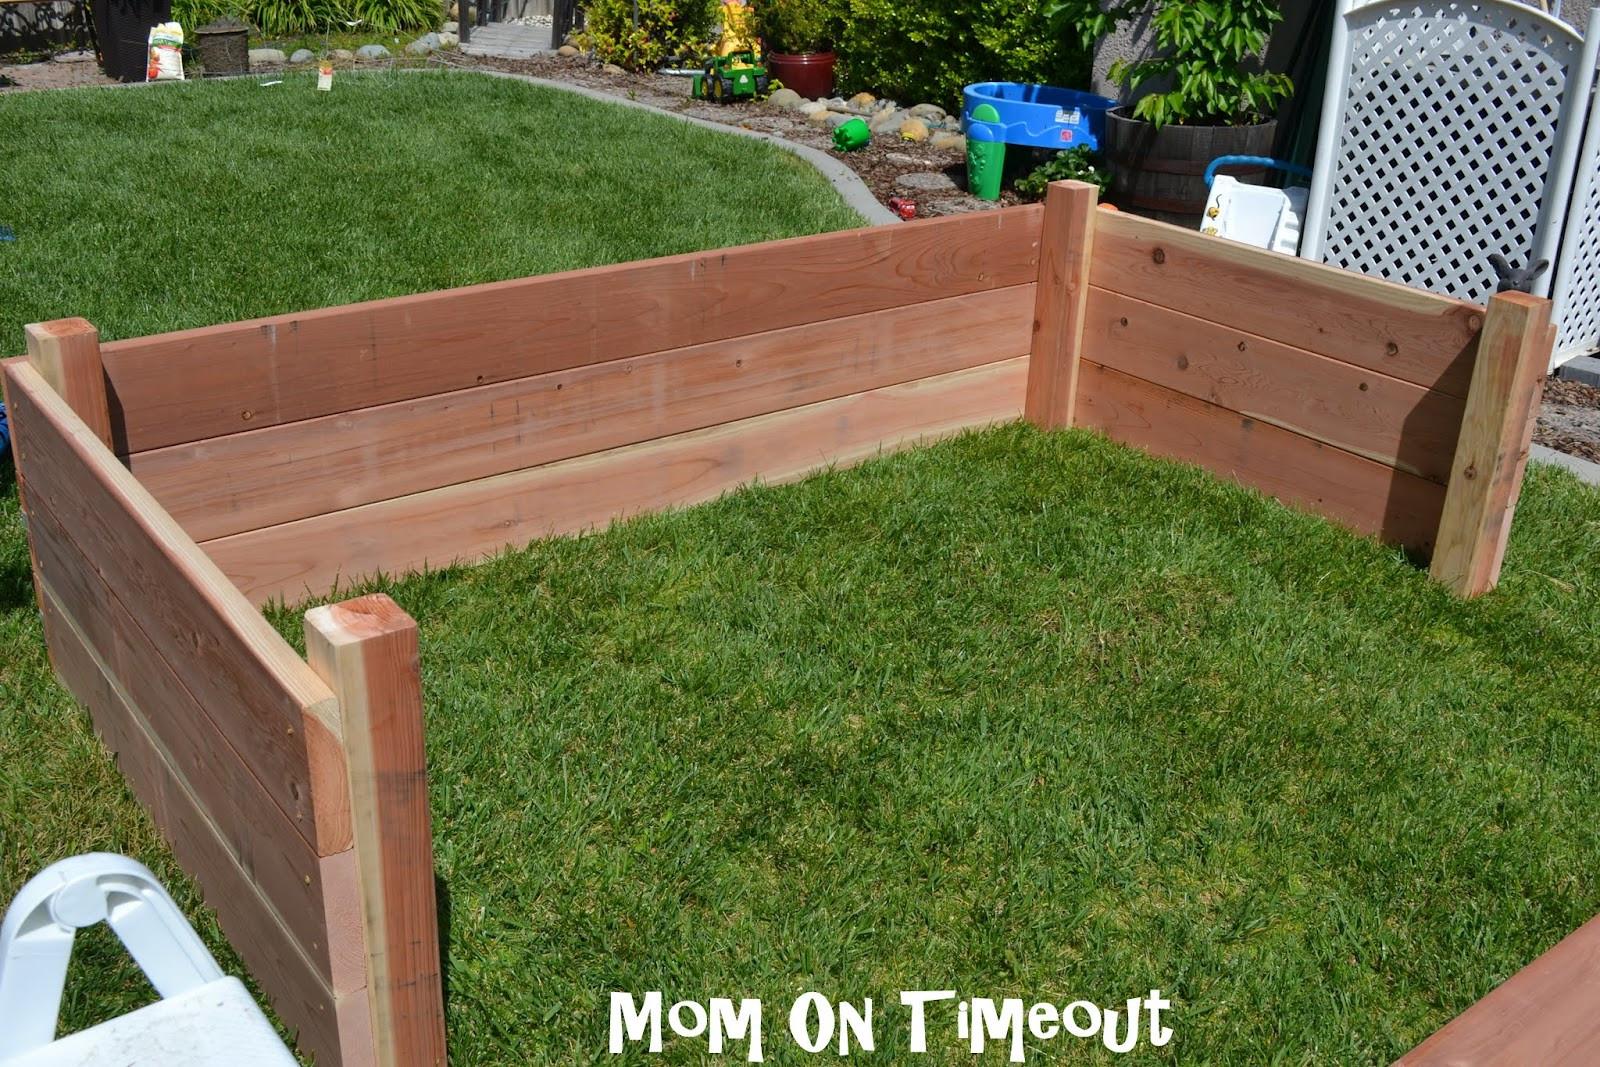 Best ideas about DIY Planter Box . Save or Pin DIY Garden Planter Box Tutorial Now.